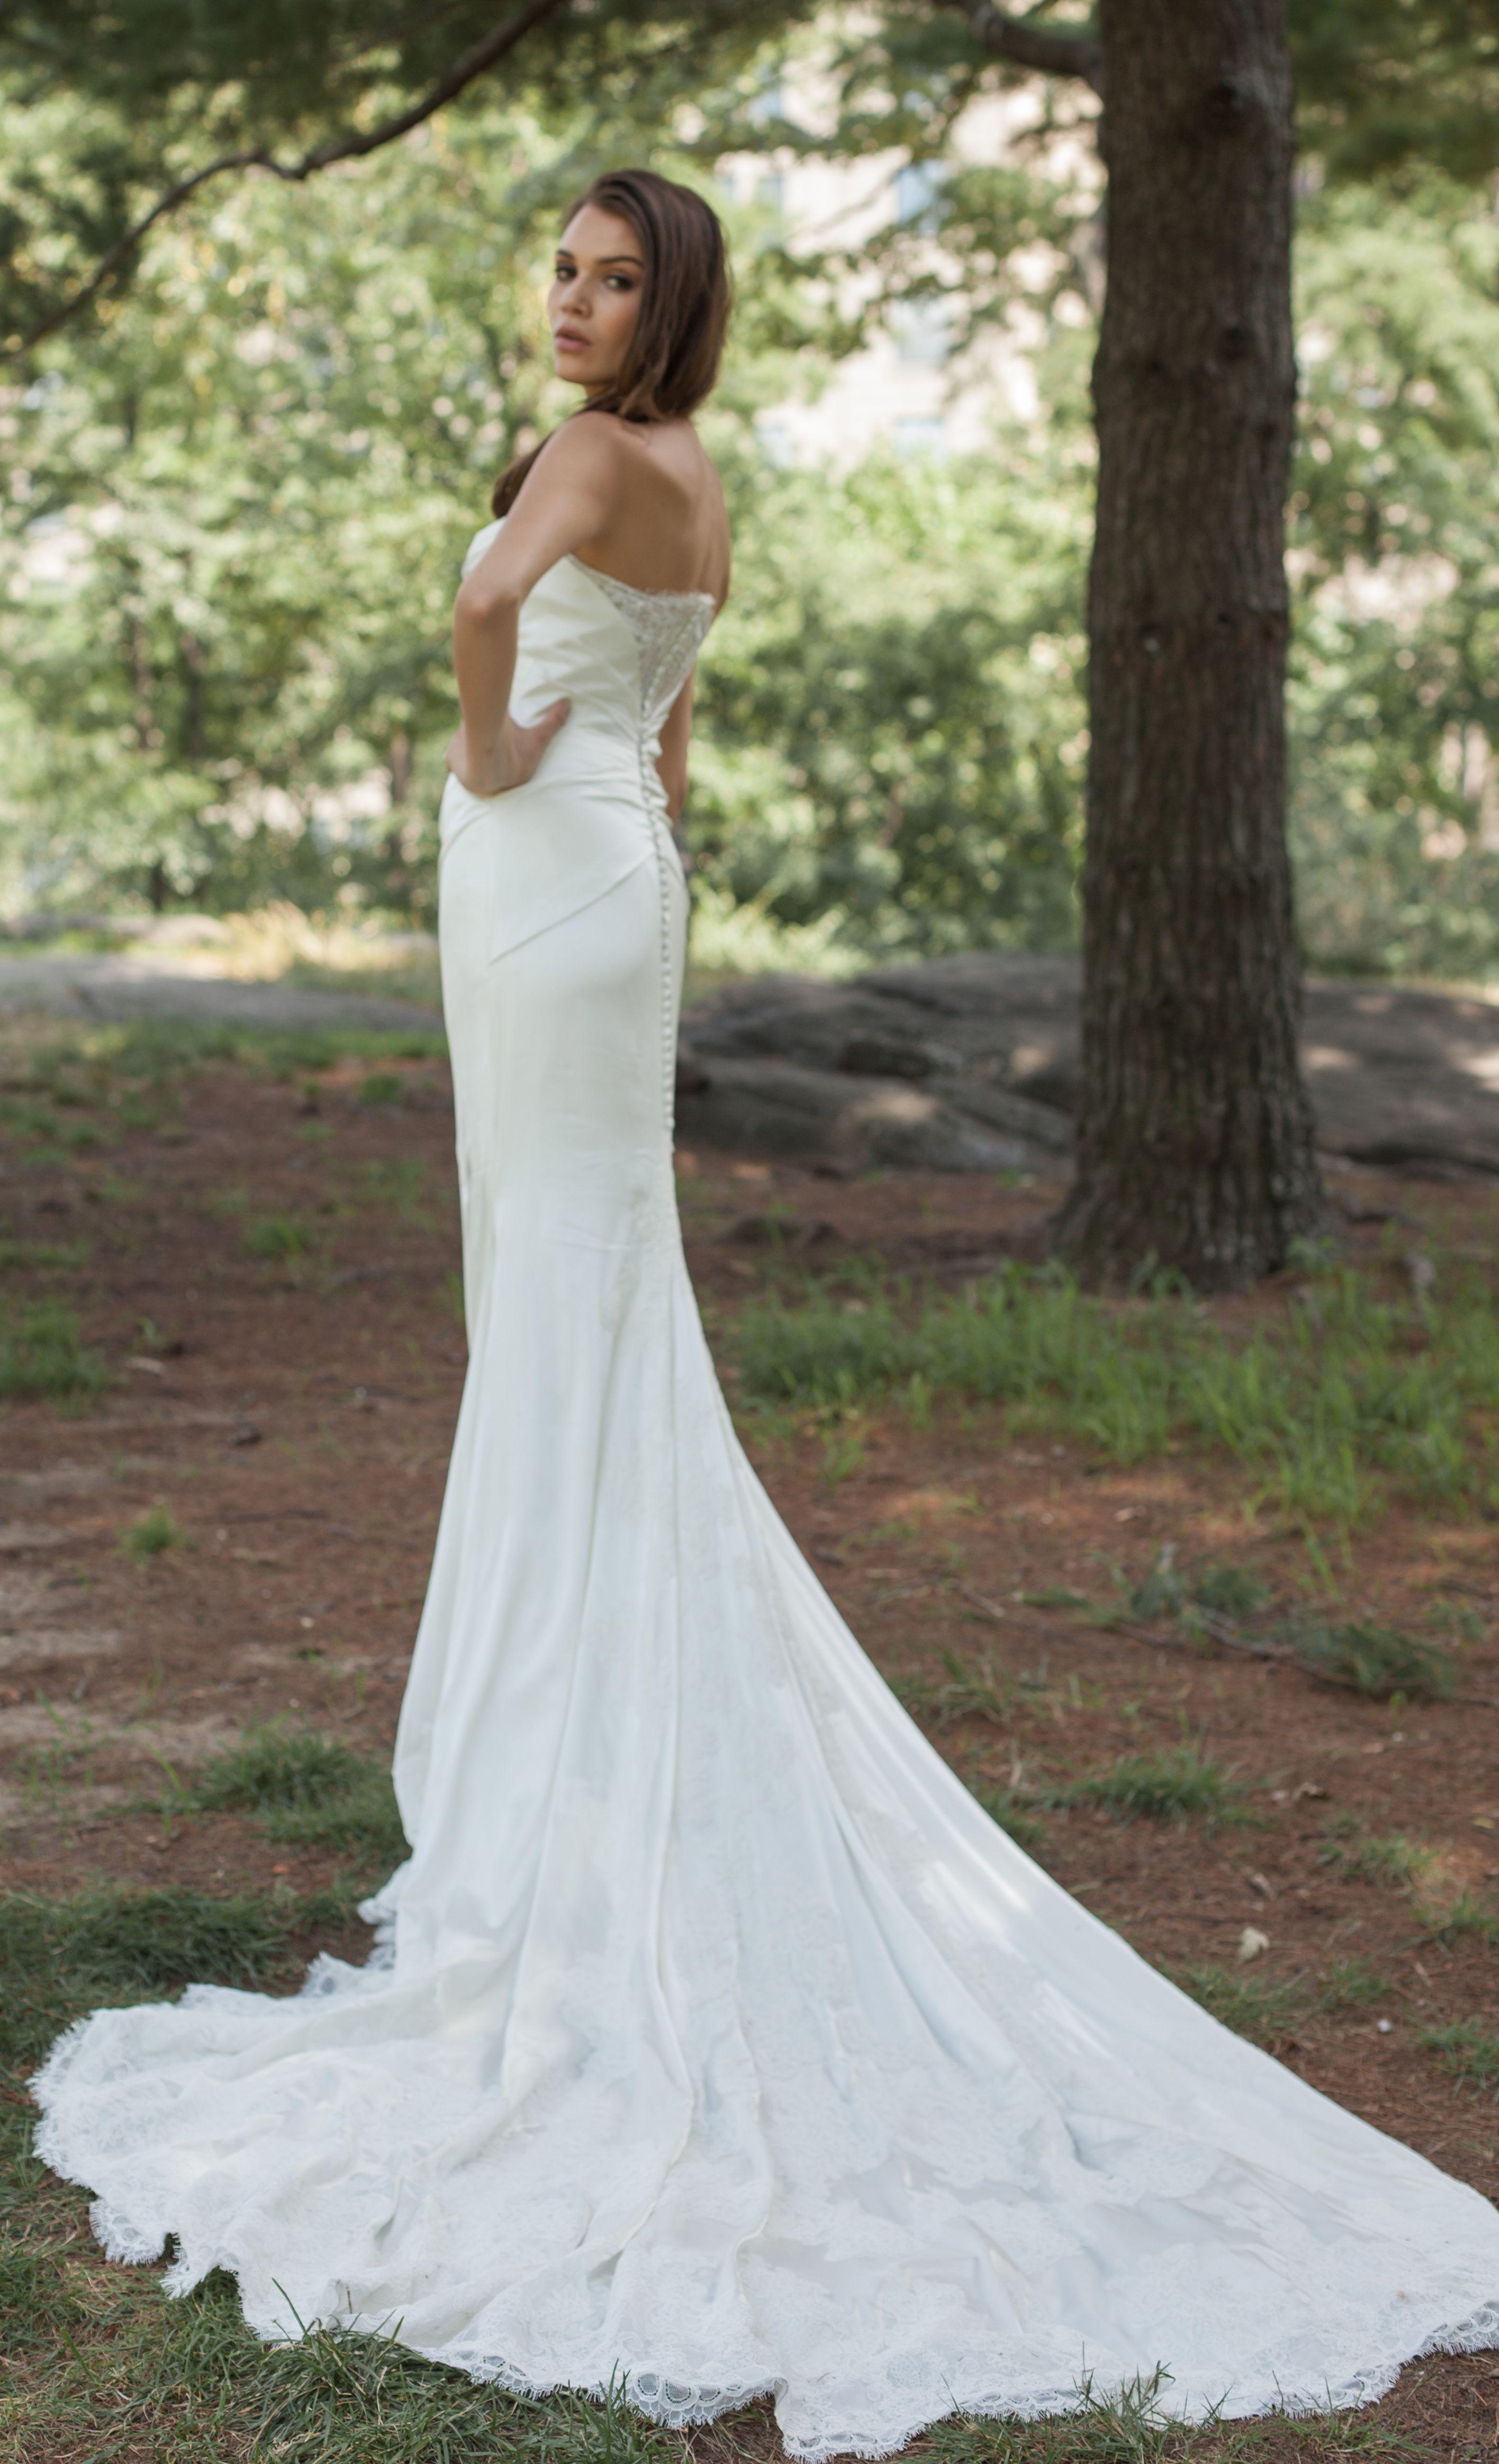 Inez Wedding Dress Kelly Faetanini Flowing Wedding Dresses Top Wedding Dresses Wedding Dresses [ 4656 x 2832 Pixel ]